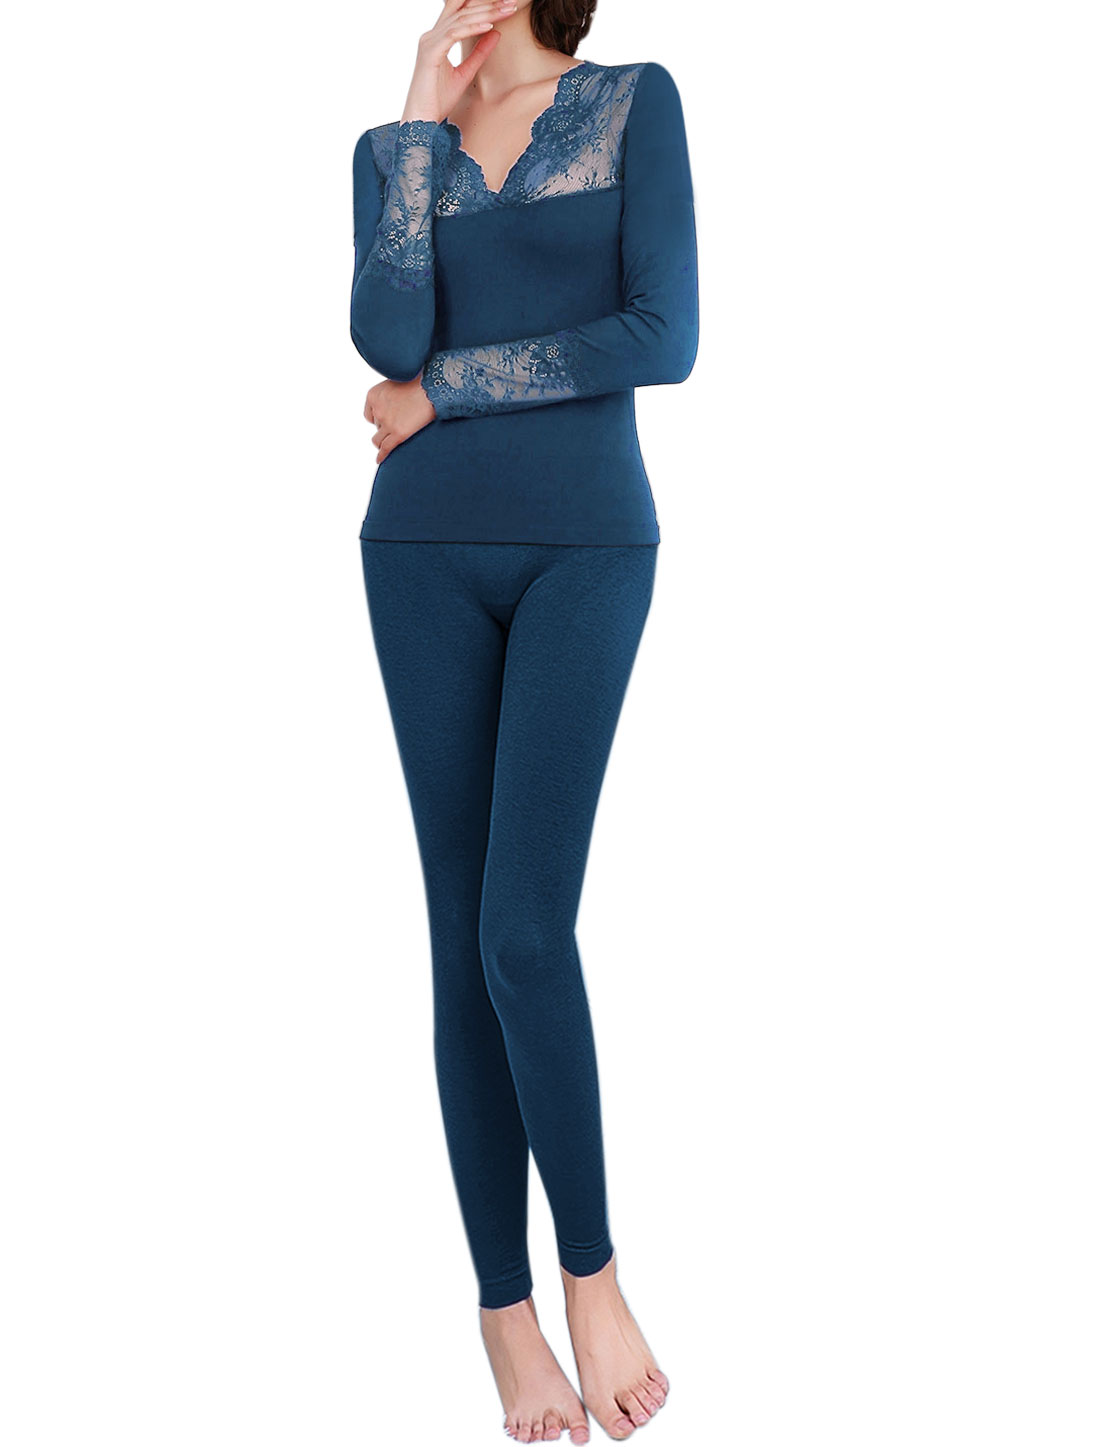 Women Thermal Underwear Lace Panel Top w Skinny Pants Set Blue XS